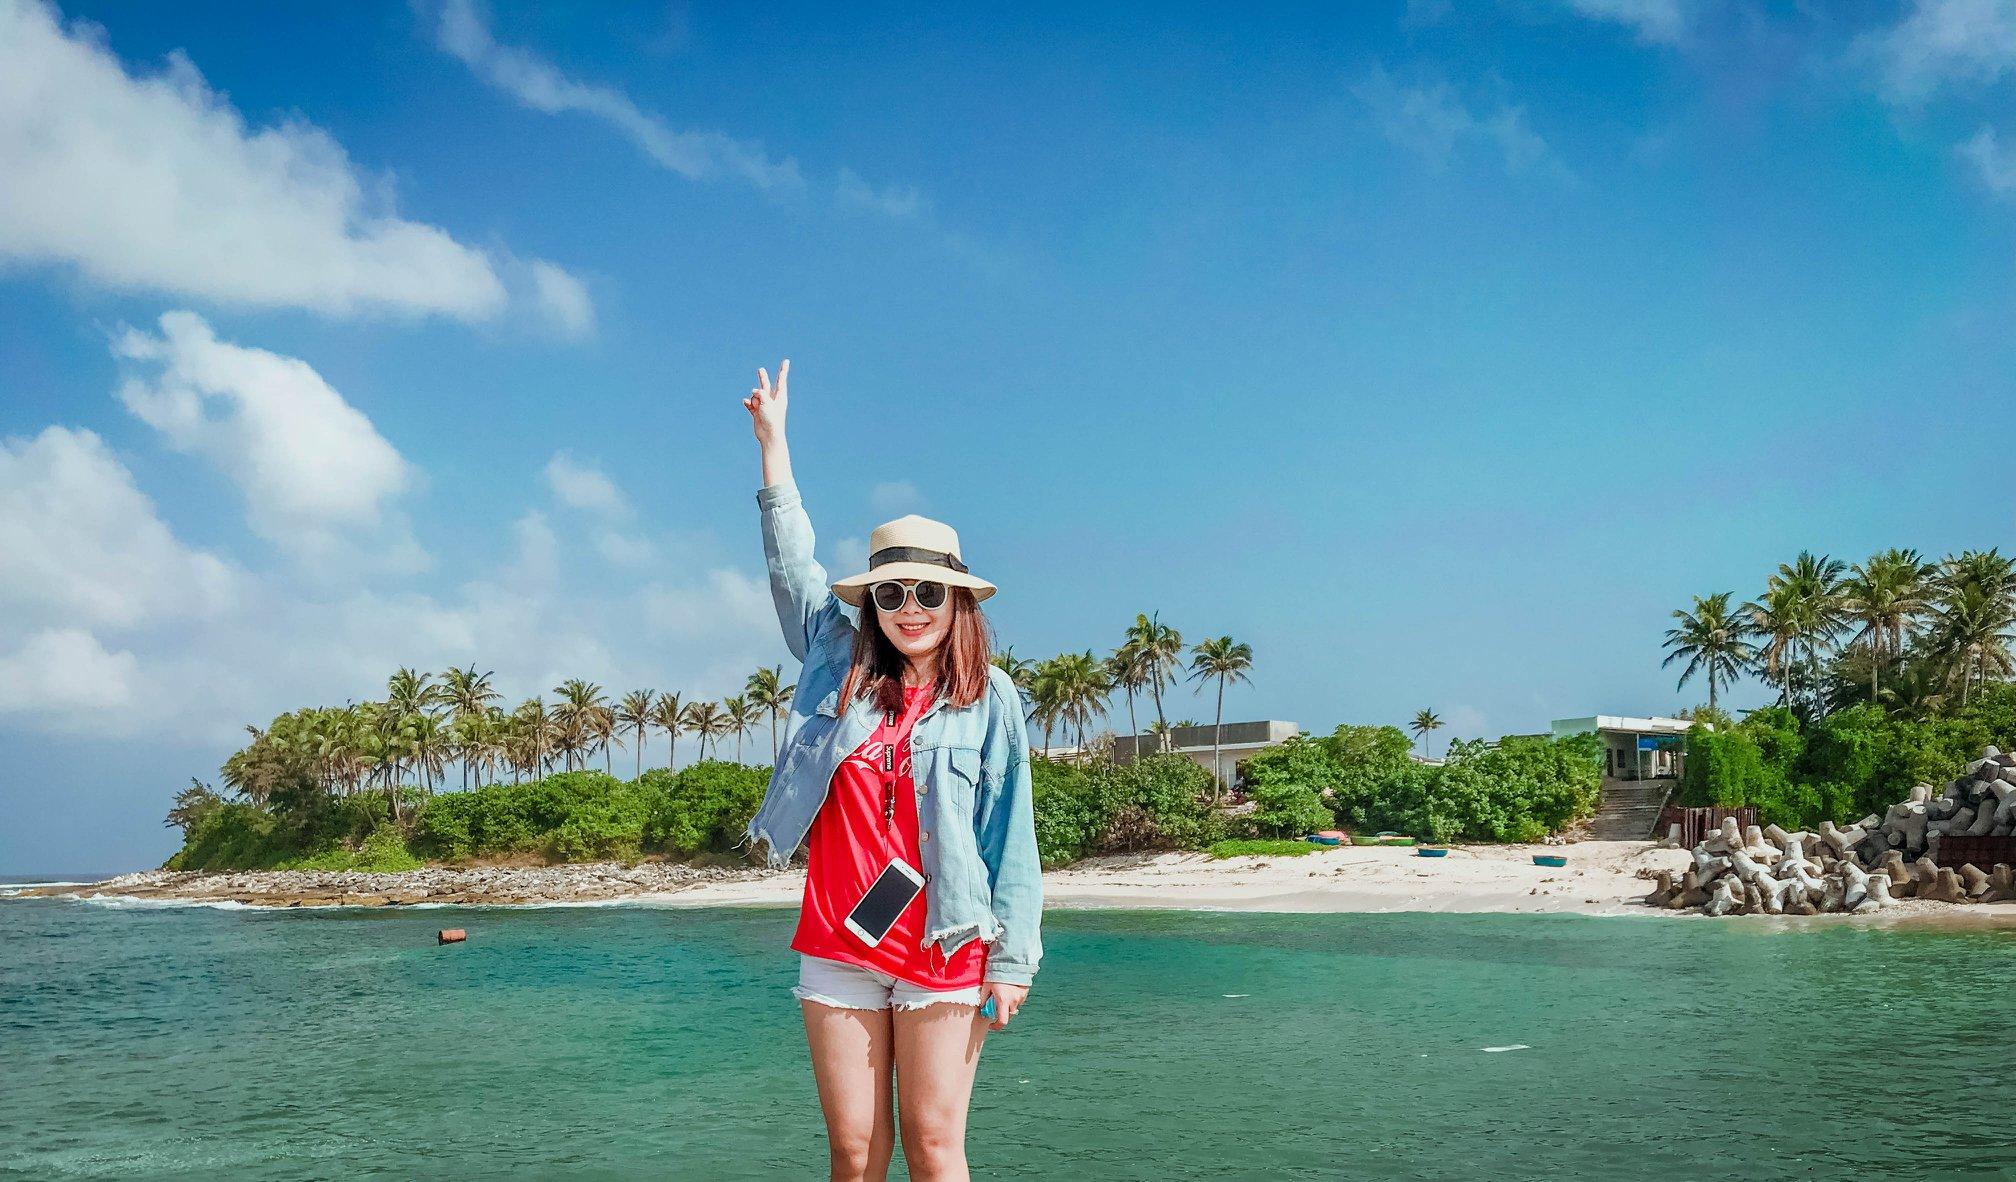 Biển Mỹ Khế